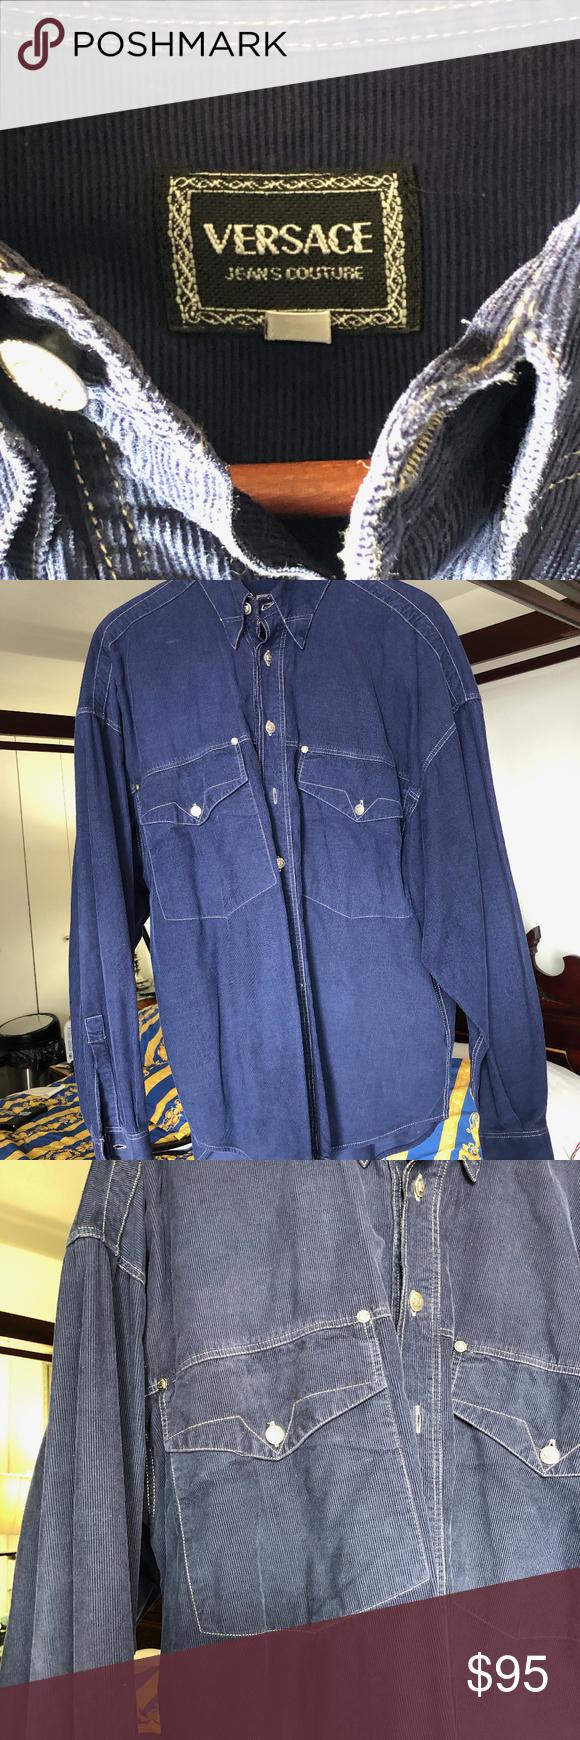 b2629b9b VERSACE JEANS COUTURE Blue Corduroy Shirt Large GENUINE VERSACE JEANS  COUTURE Blue Corduroy 100% Cotton Button Down Long Sleeve Large Mens Shirt  Large ...